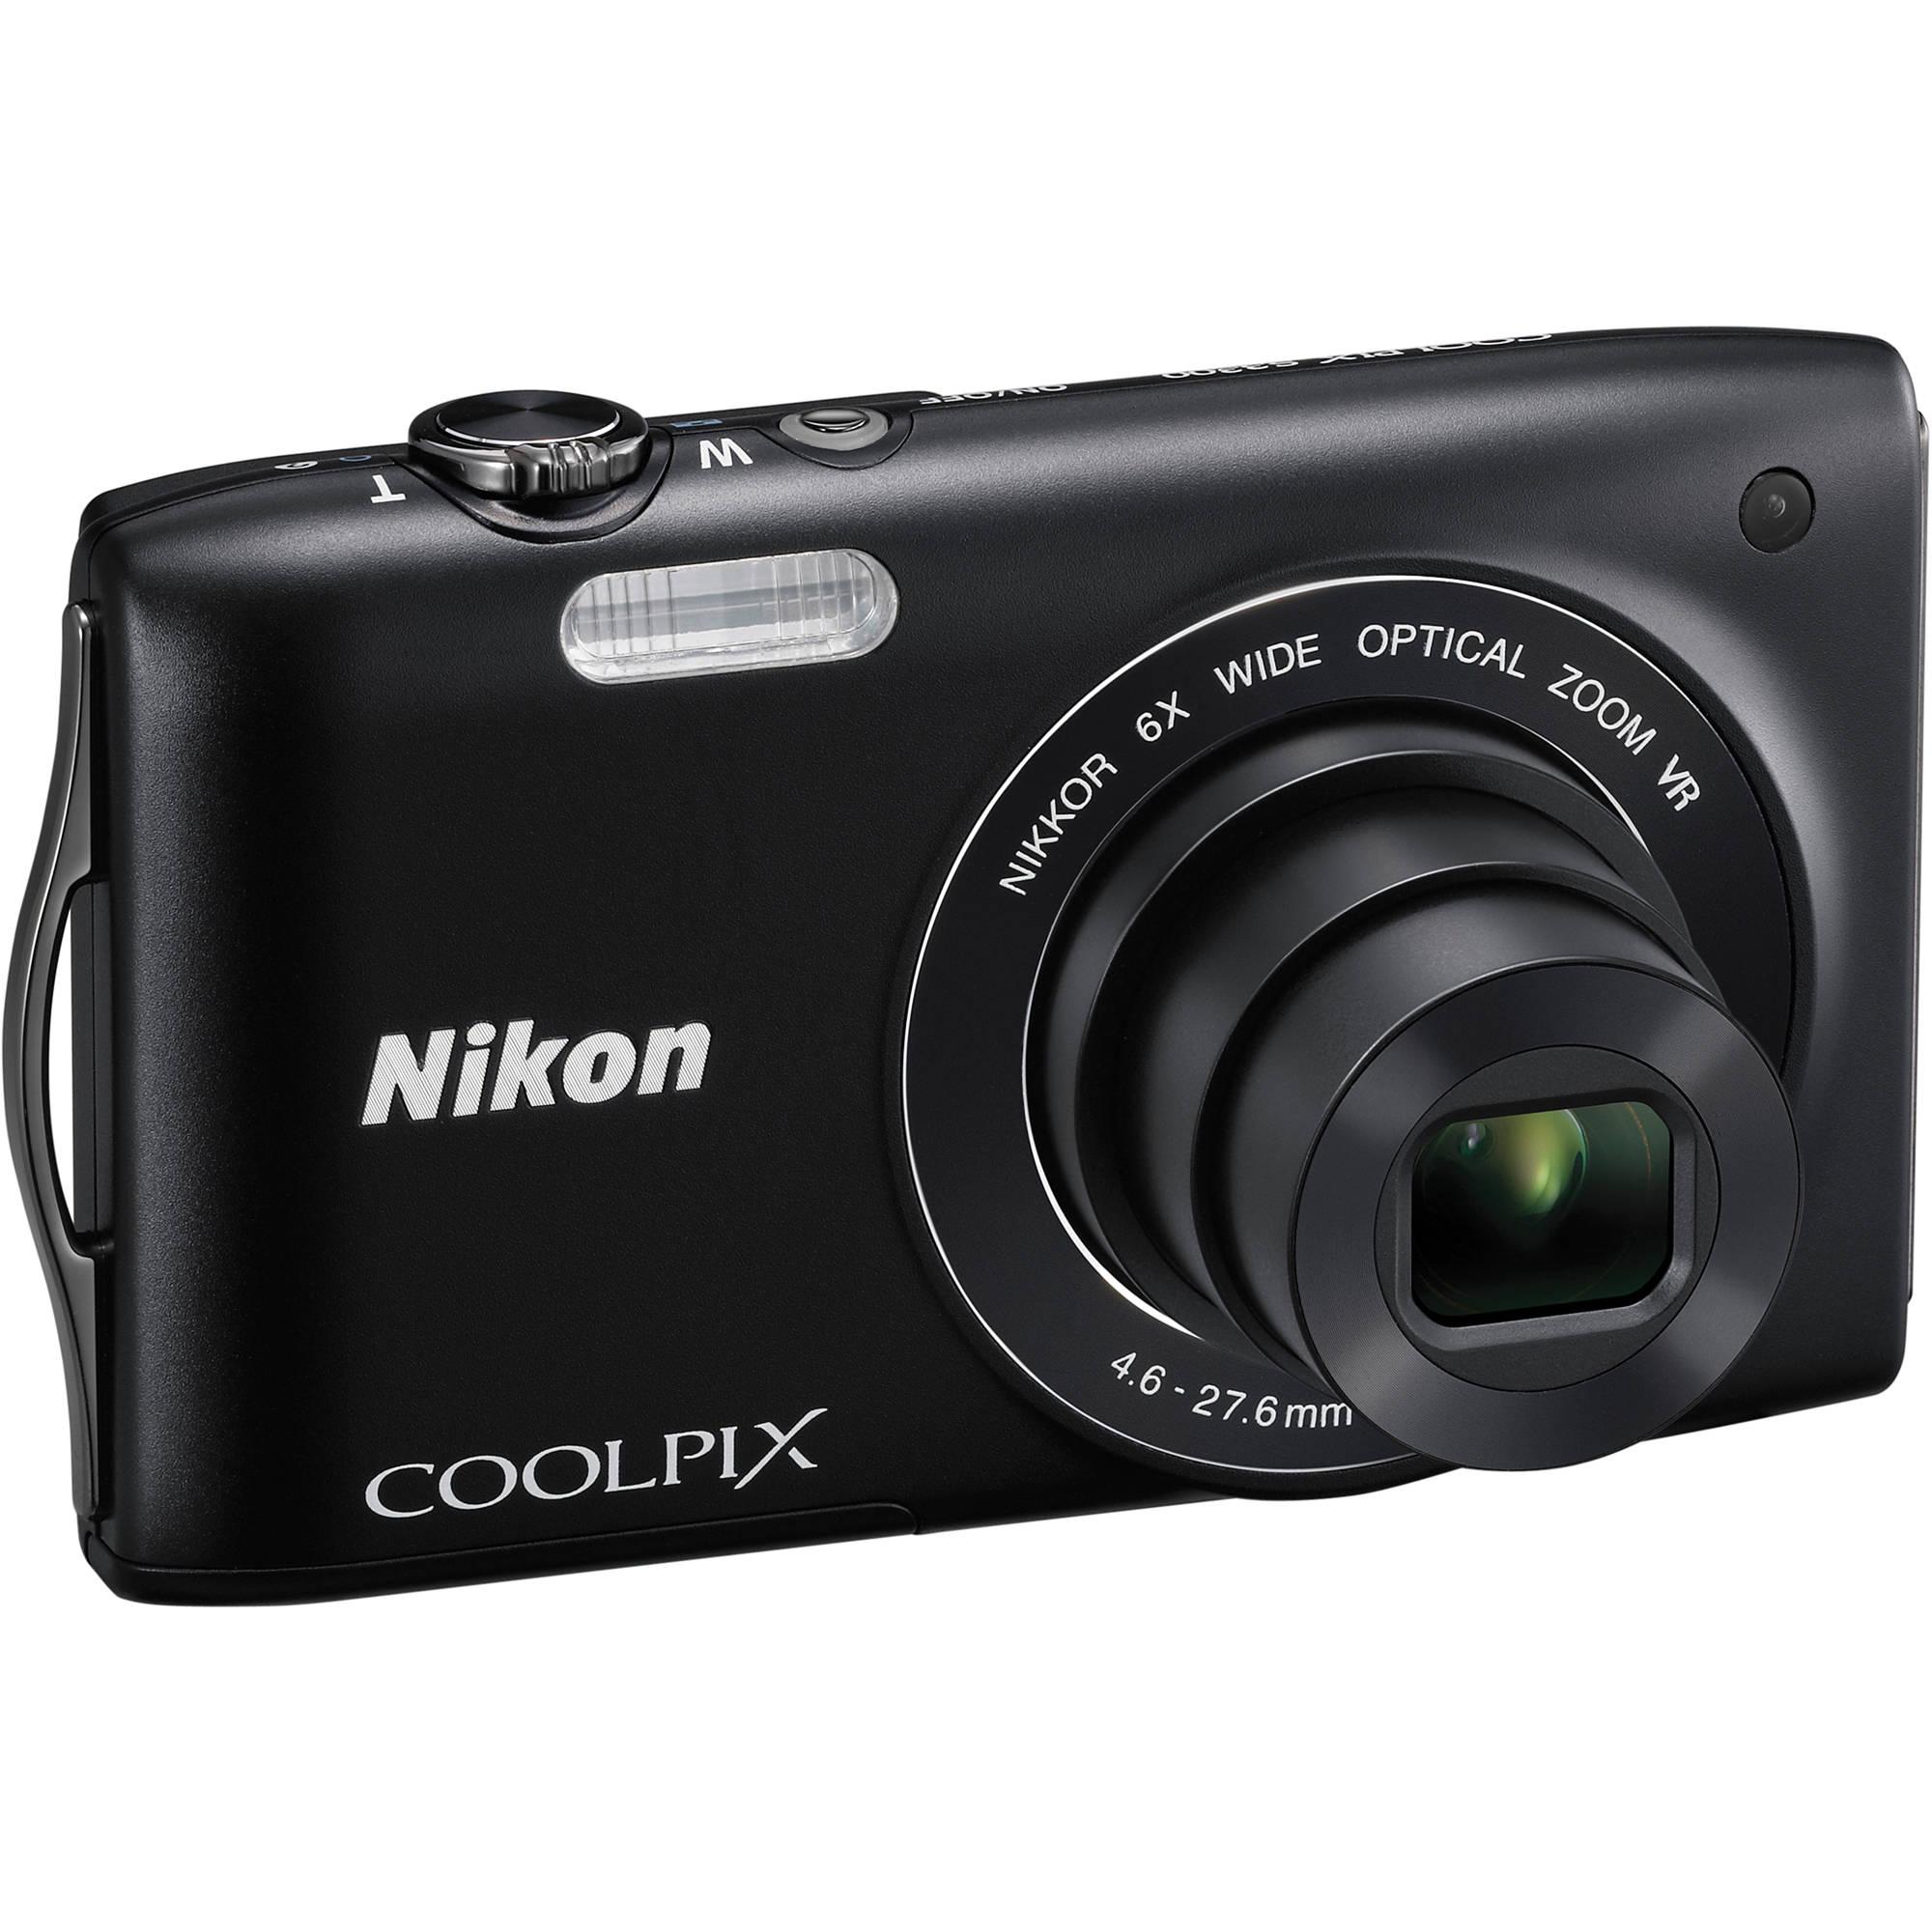 nikon coolpix s3300 digital camera black 26310 b h photo video rh bhphotovideo com